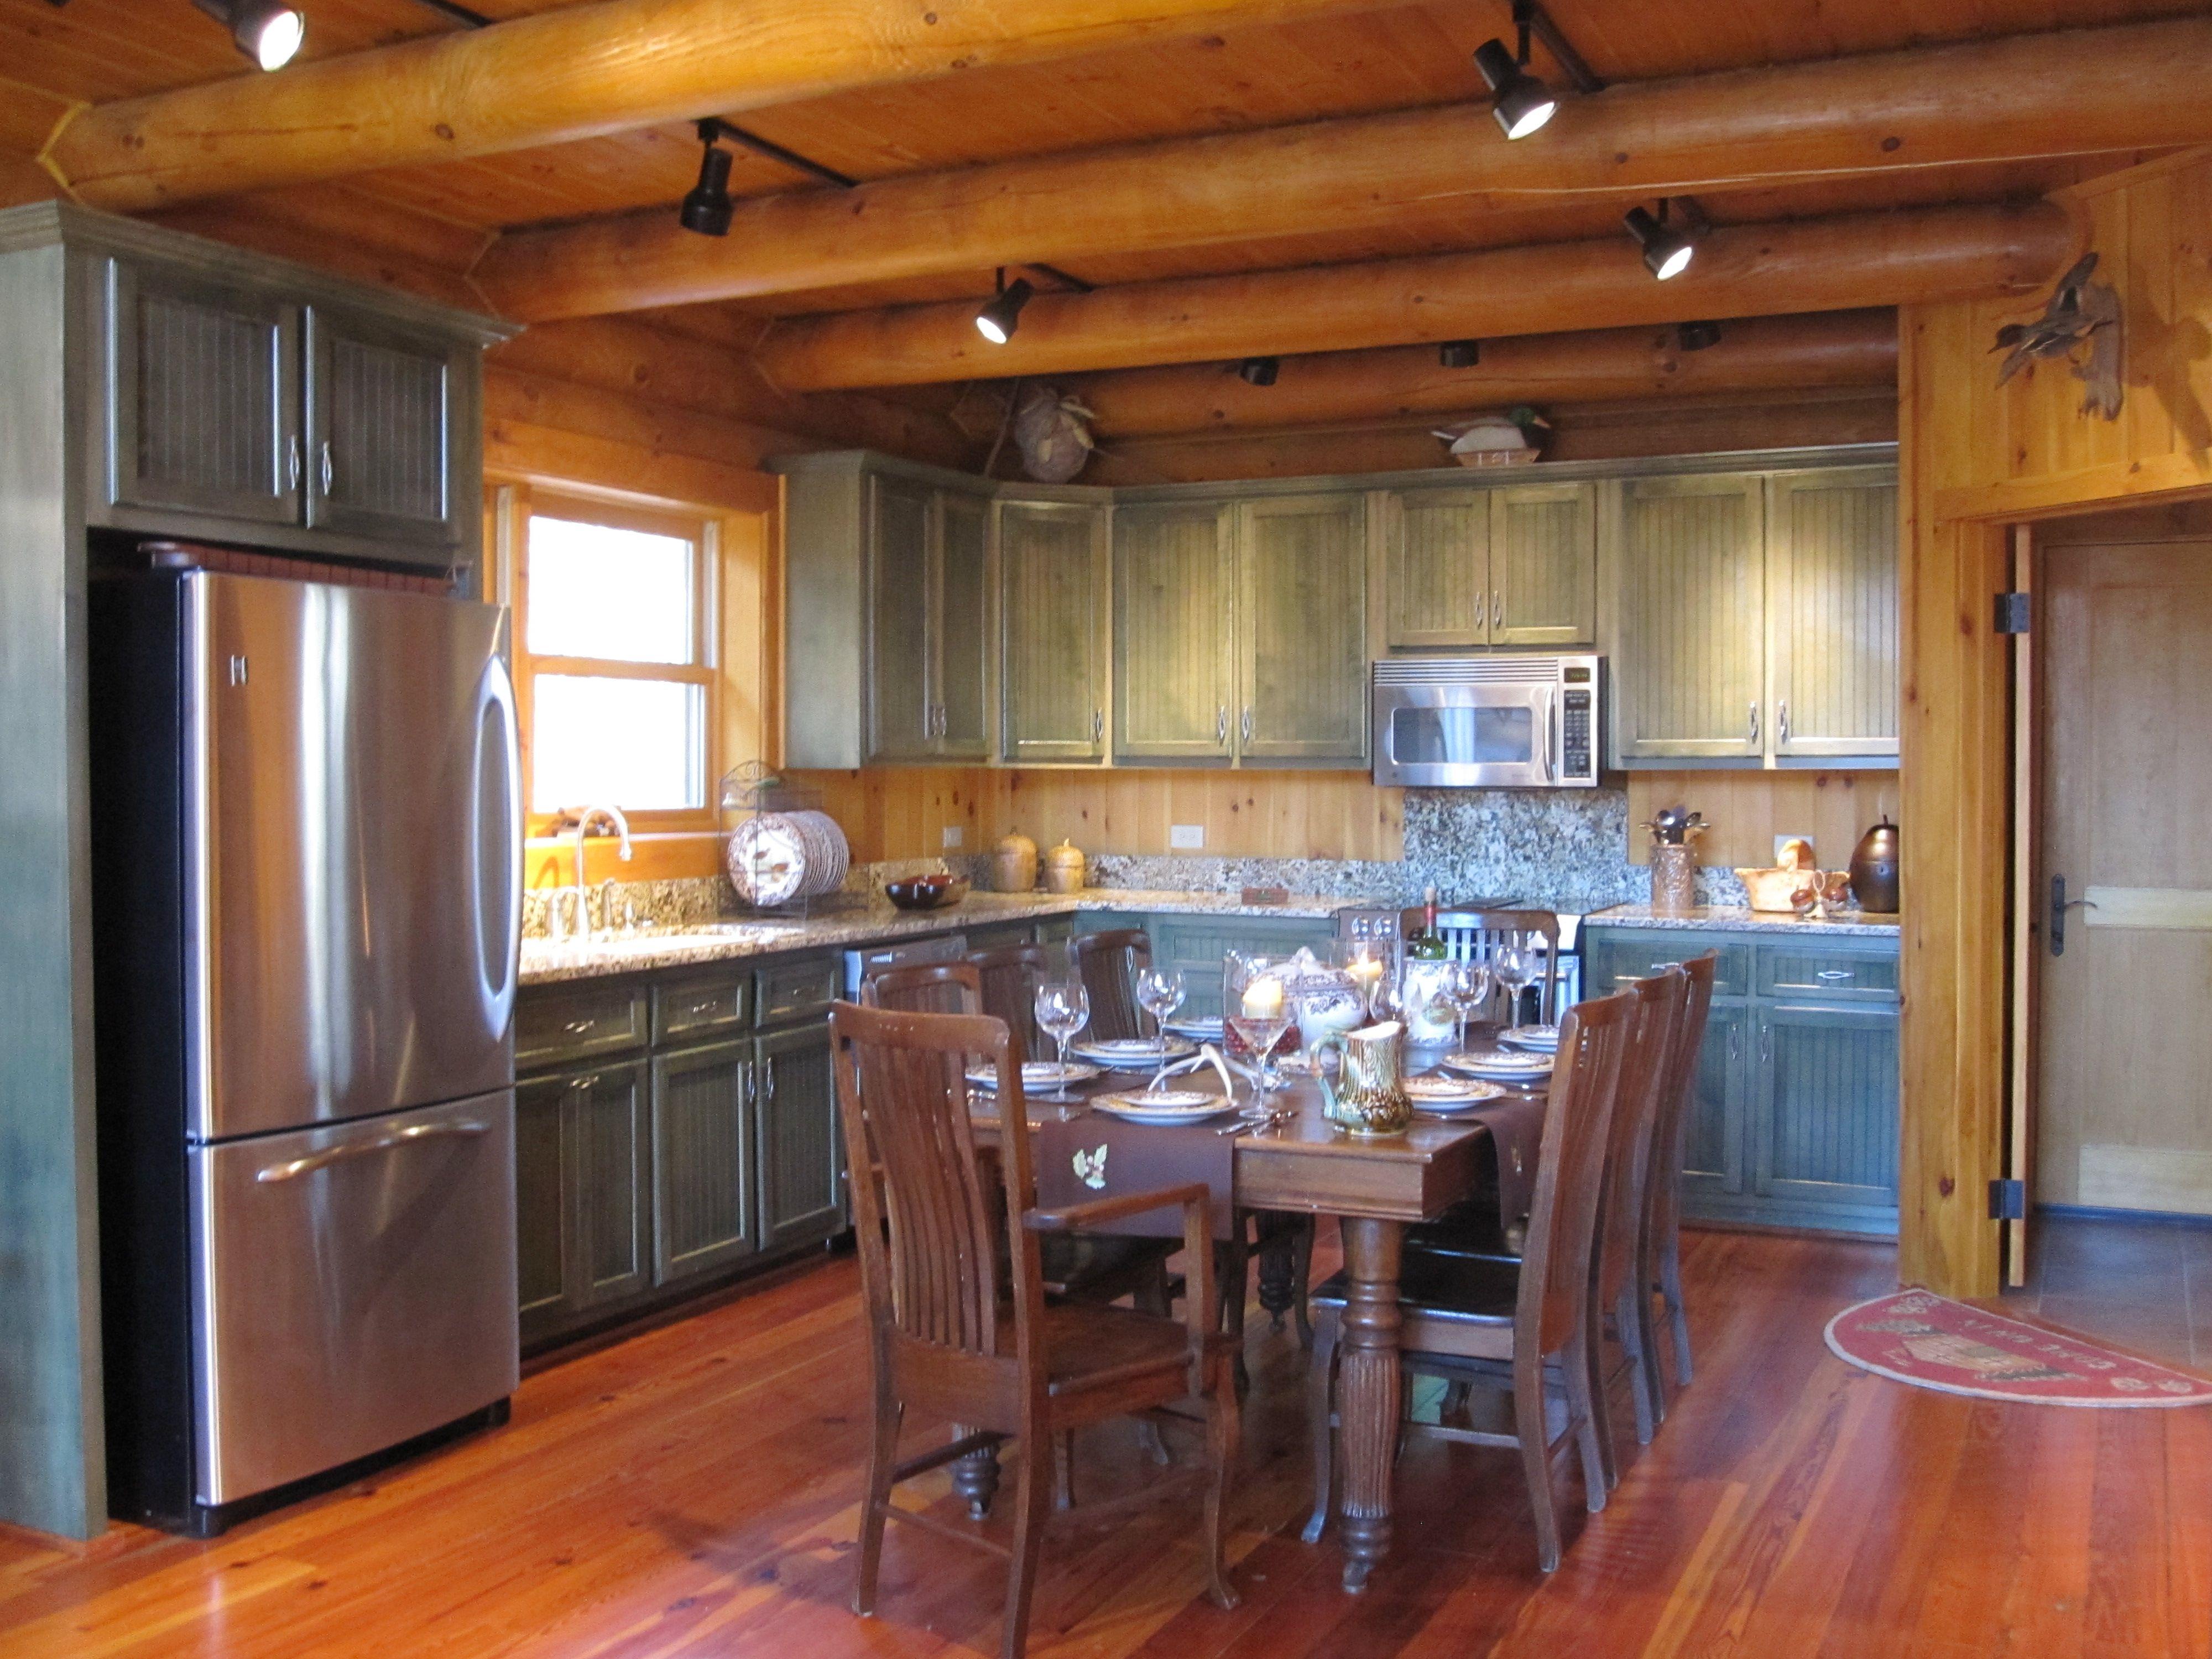 Bellissimoandbella Blogspot Com Log Cabin Kitchen Green Cabinets Rustic Kitchen Log Home Kitchens Cabin Kitchens